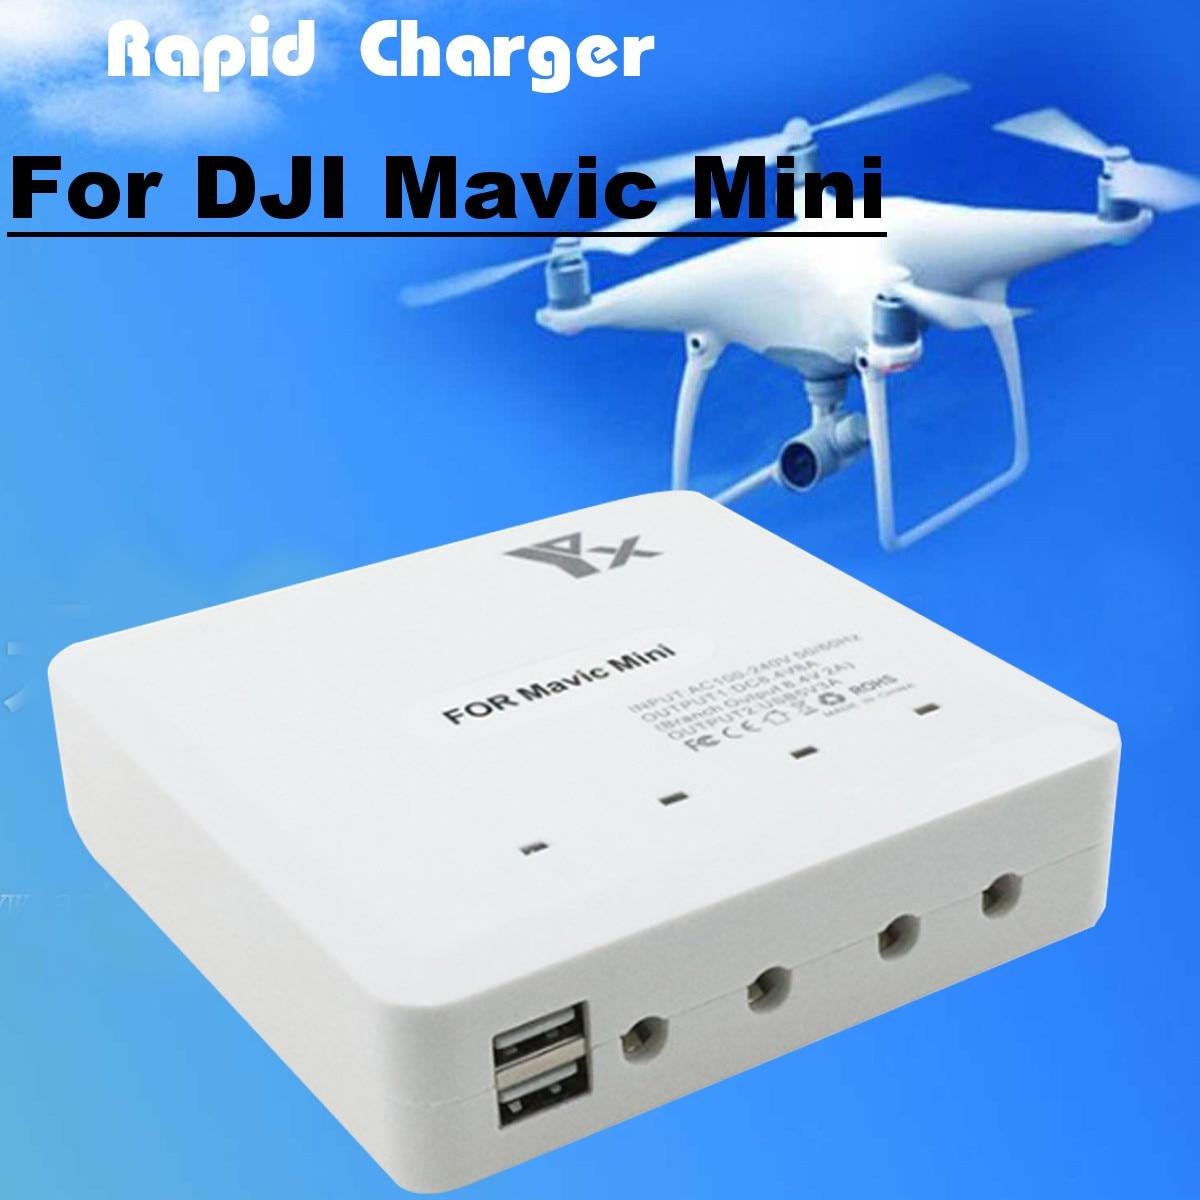 6-IN-1 Rapid Multi Battery Charger Remote Controller Balance Charger Mavic Mini Accessories For DJI Mavic Mini Battery